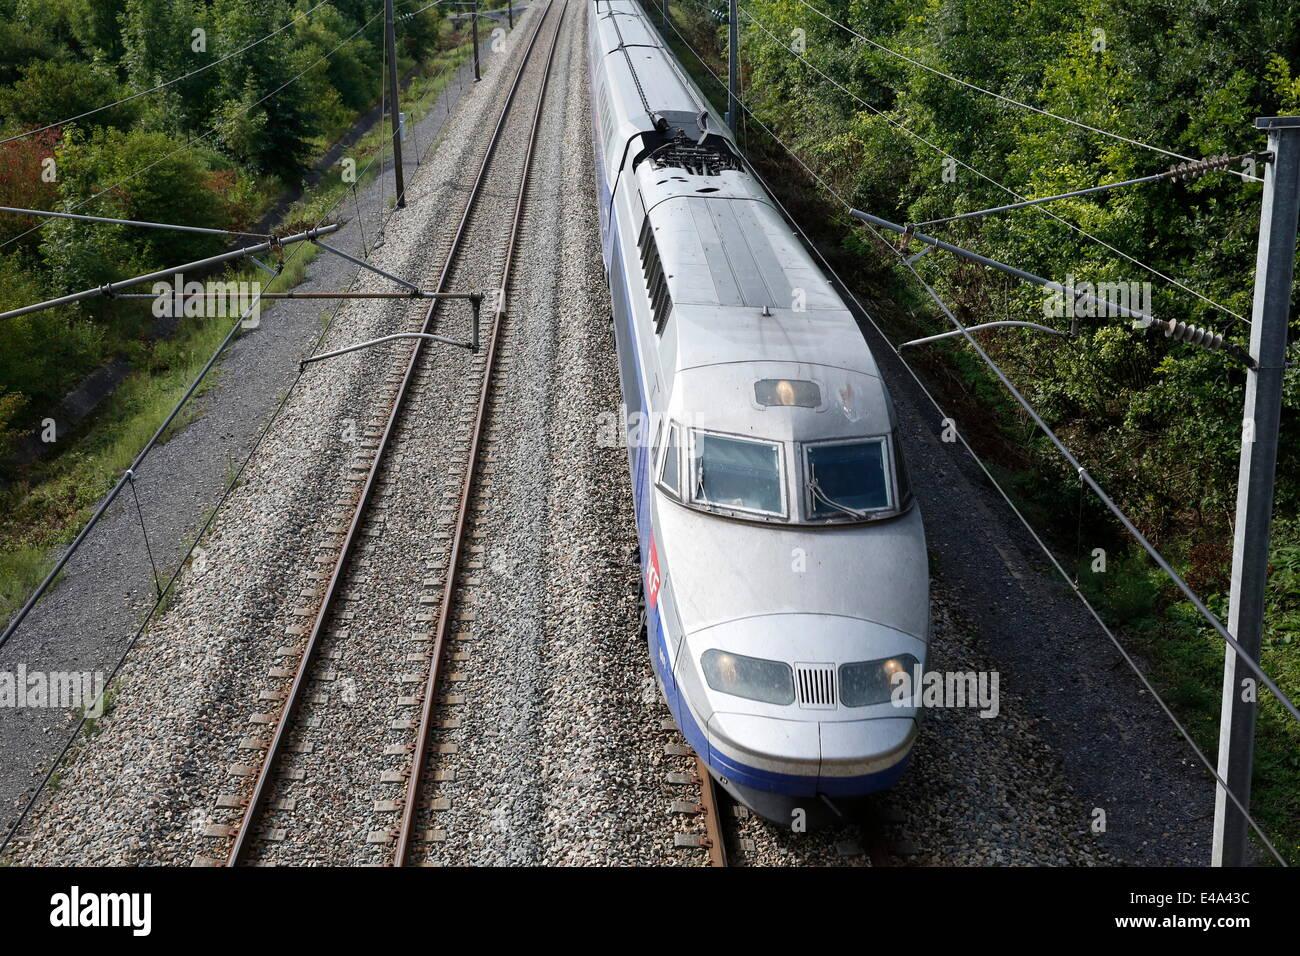 High-speed train, Pas-de-Calais, France, Europe - Stock Image